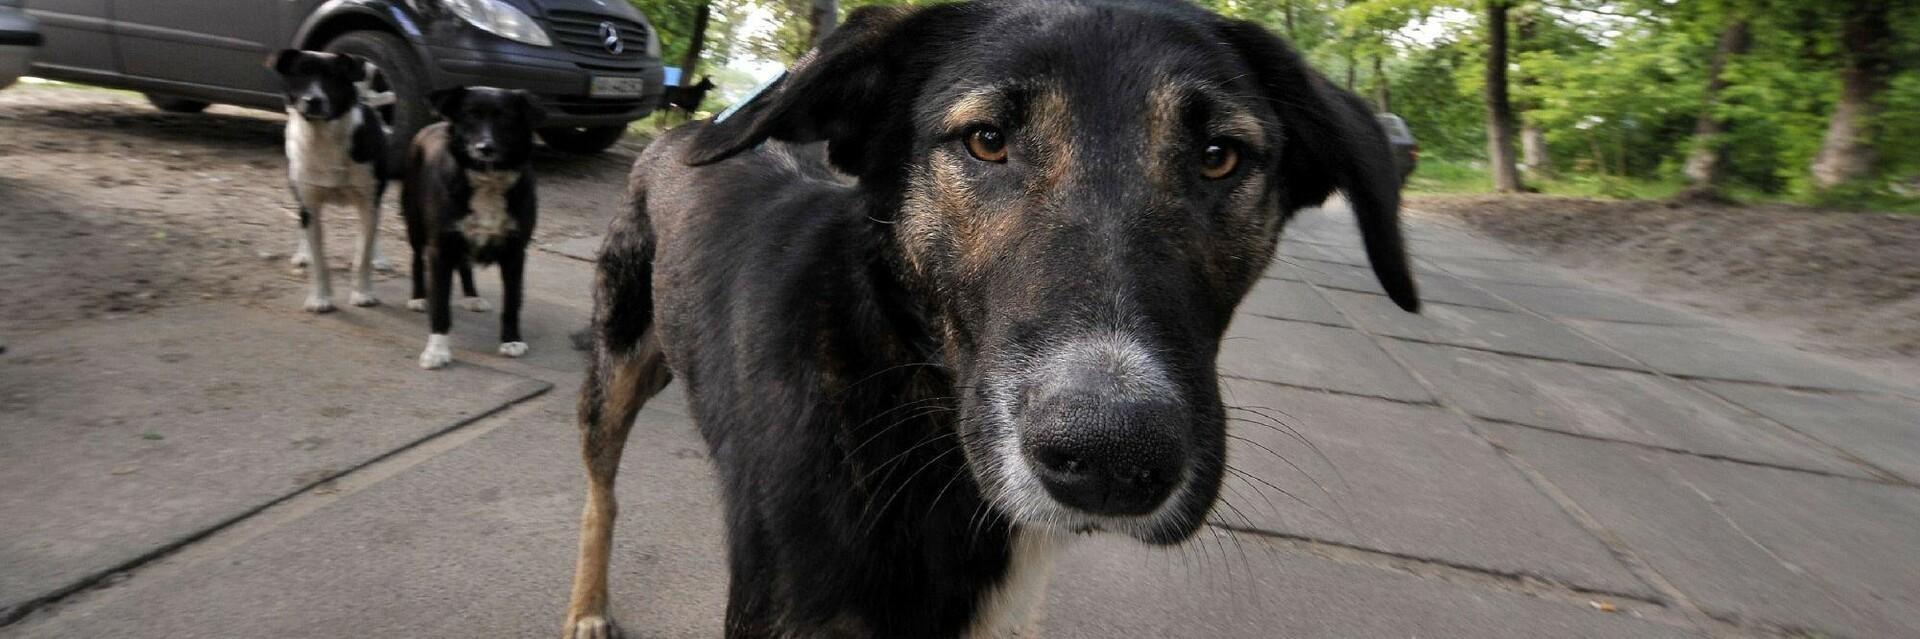 Stray dogs in Ukraine